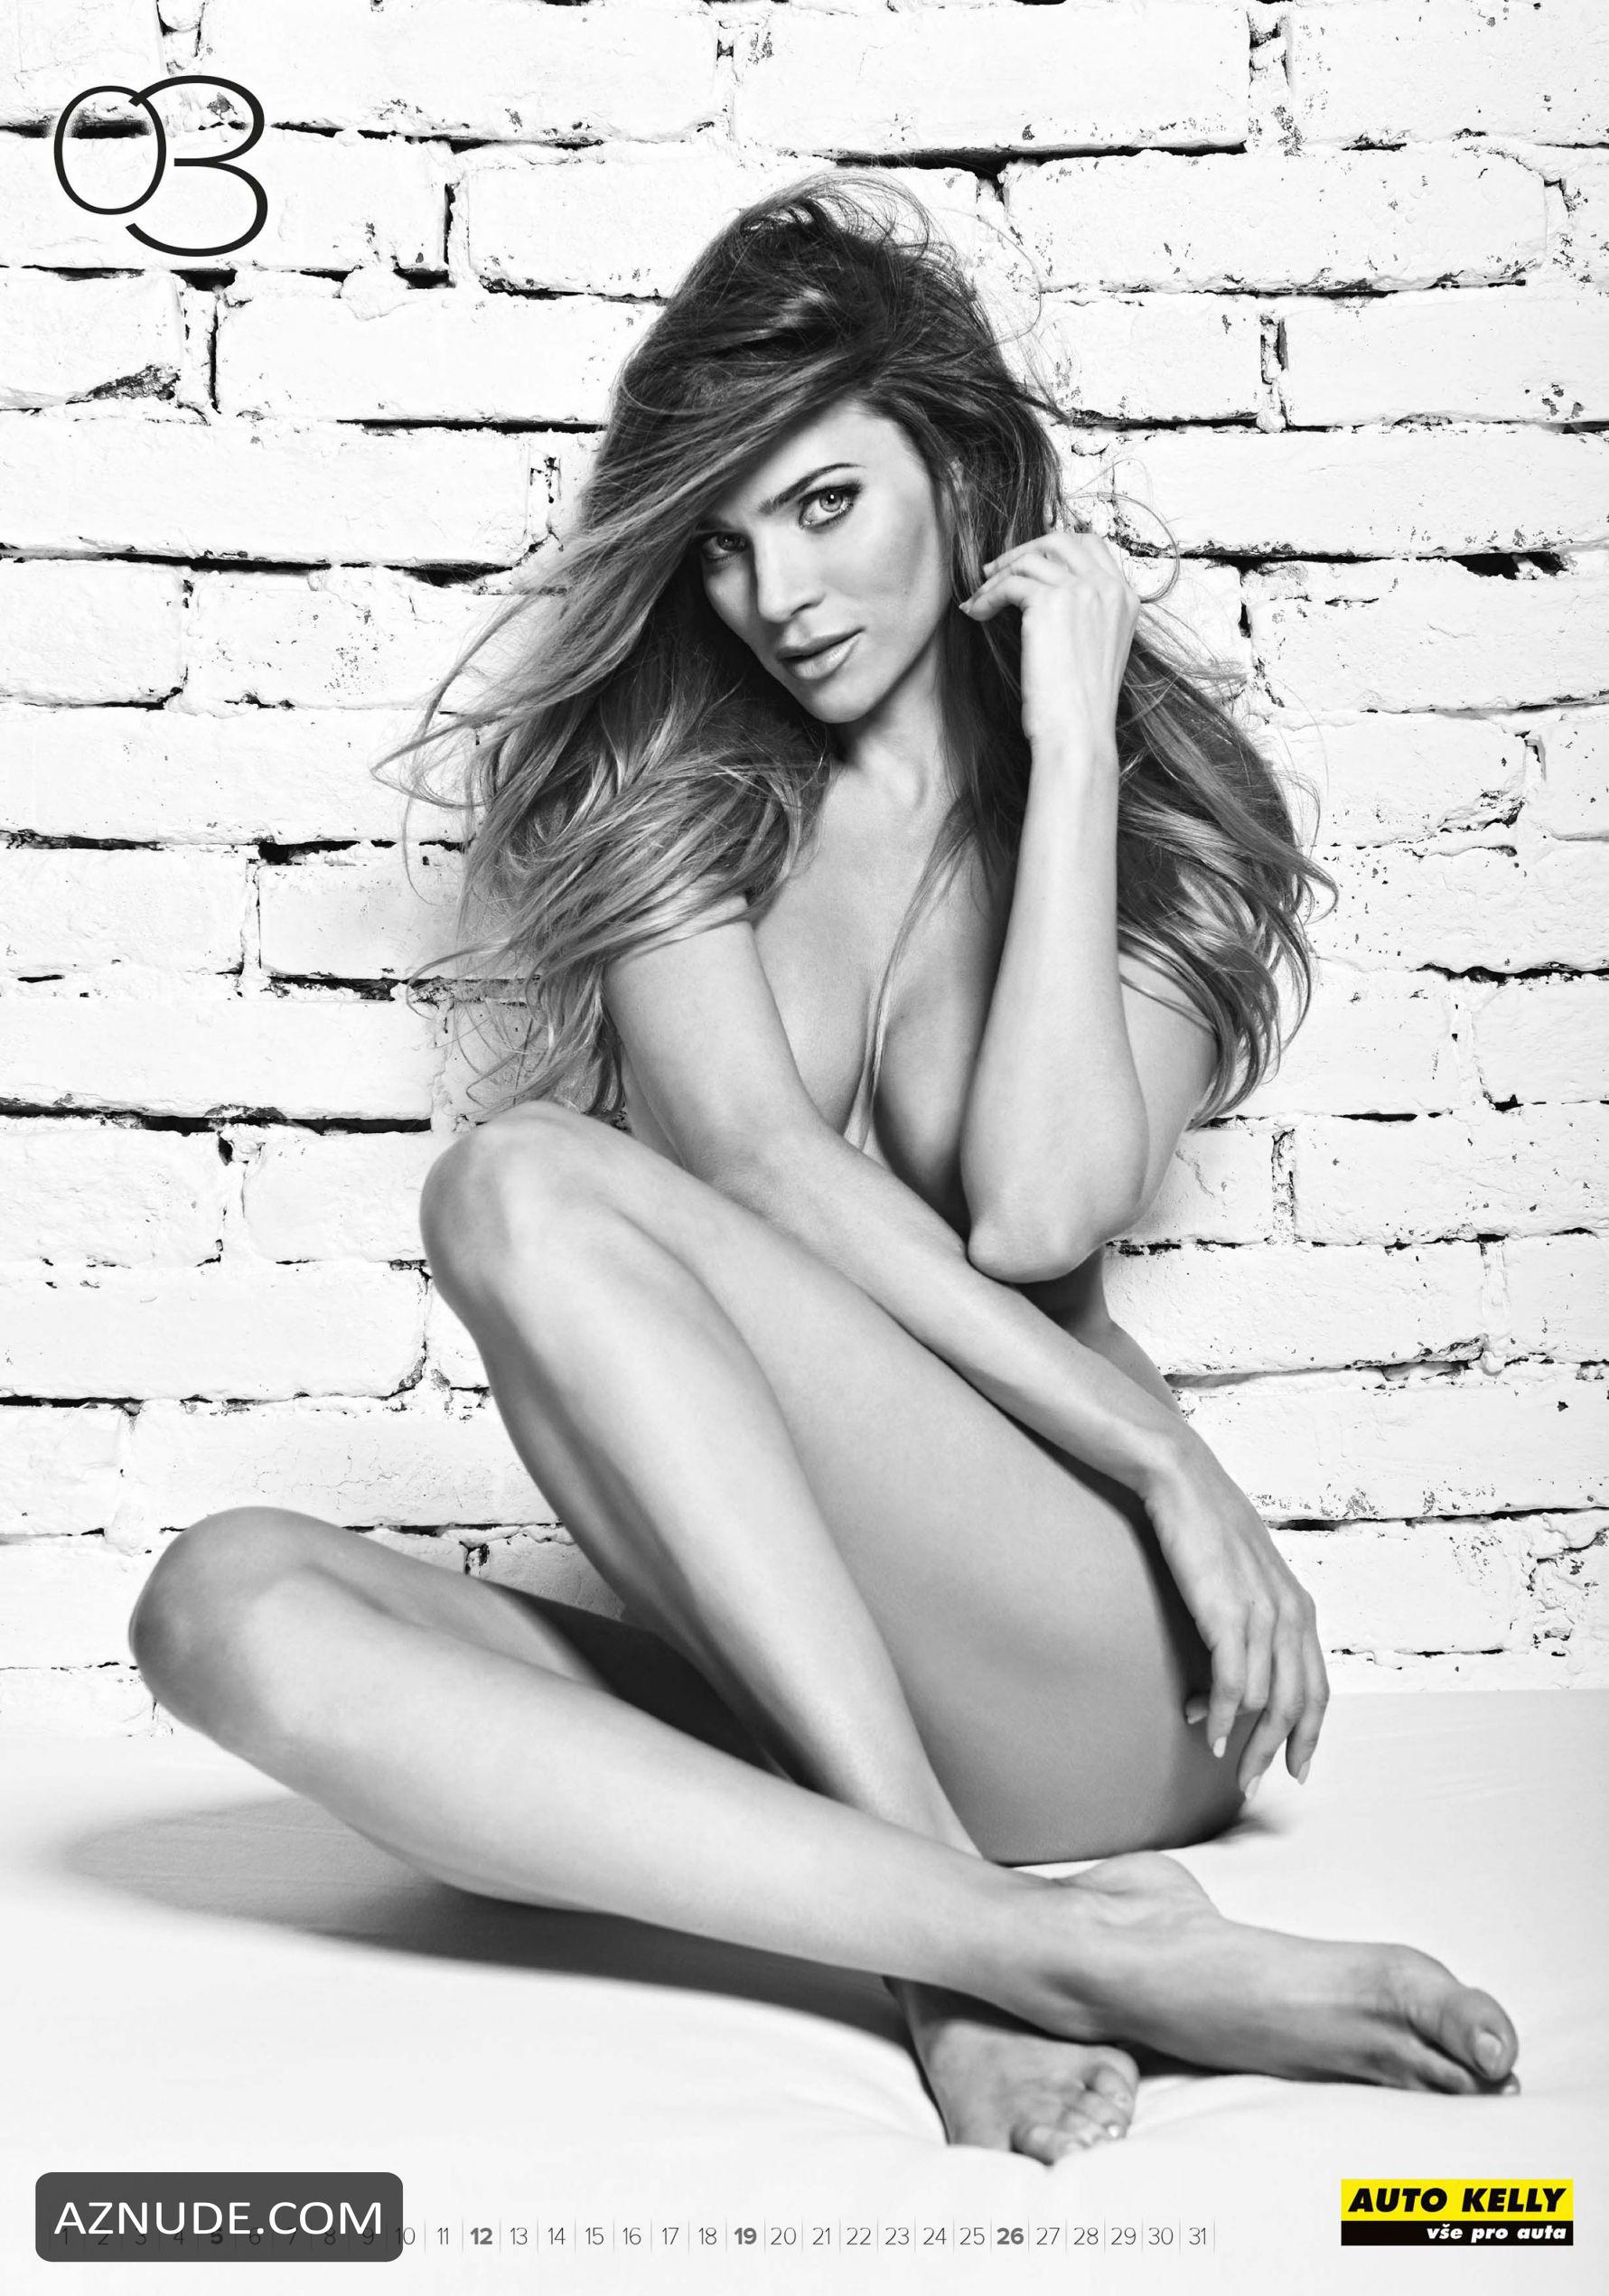 Khloe kardashian sexy pics,Juno temple leaked privates nude Hot pictures Alex kingston nude sex scene virtual encounters 2 movie,India westbrooks sexy photos